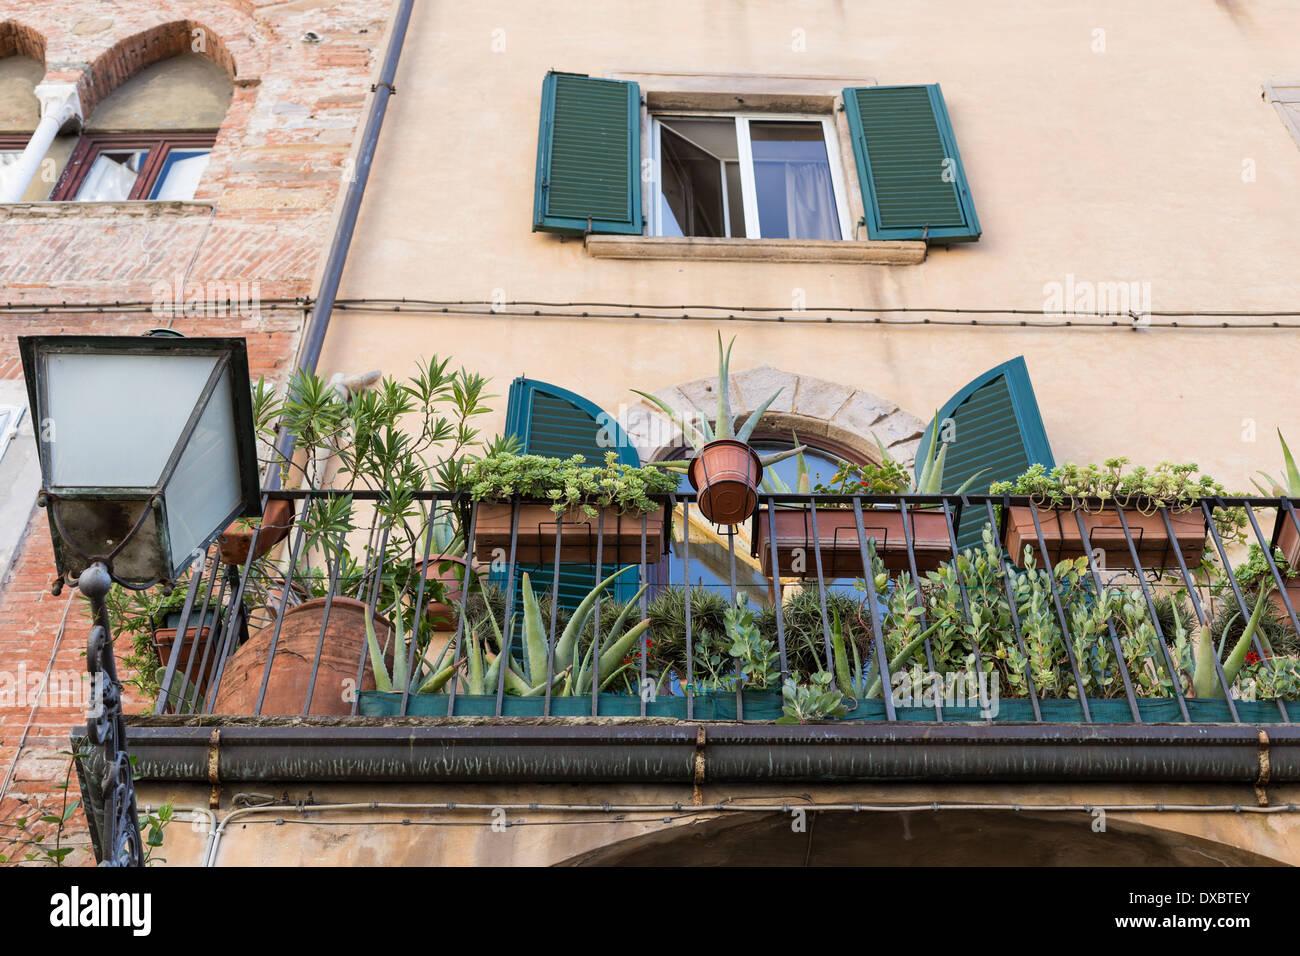 typical italian balcony stockfotos typical italian balcony bilder alamy. Black Bedroom Furniture Sets. Home Design Ideas